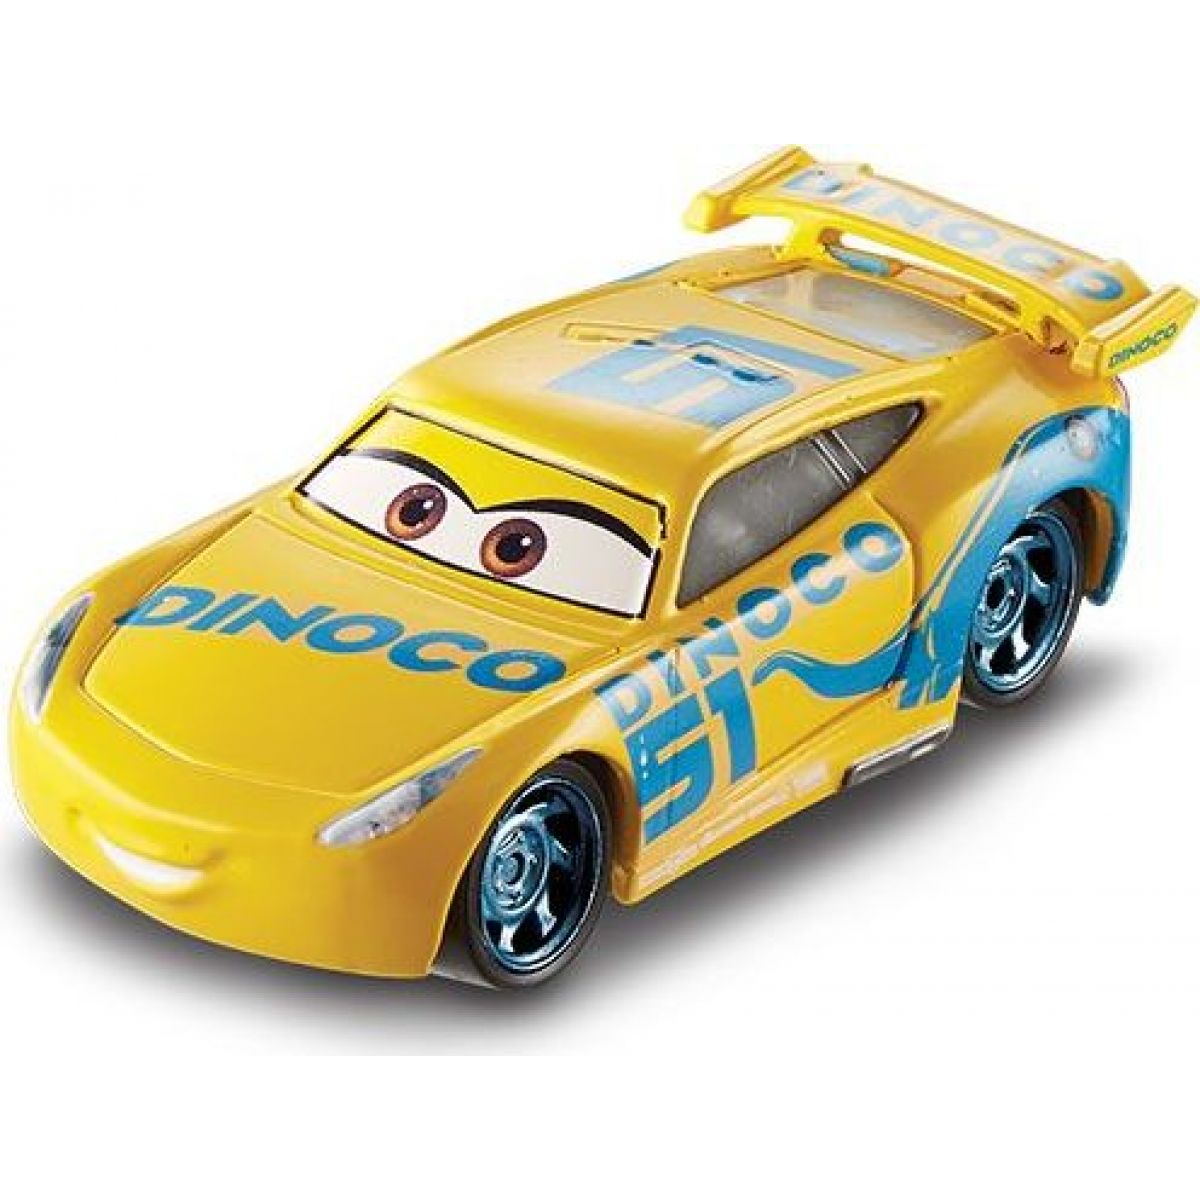 Mattel Cars 3 Auta Dinoco